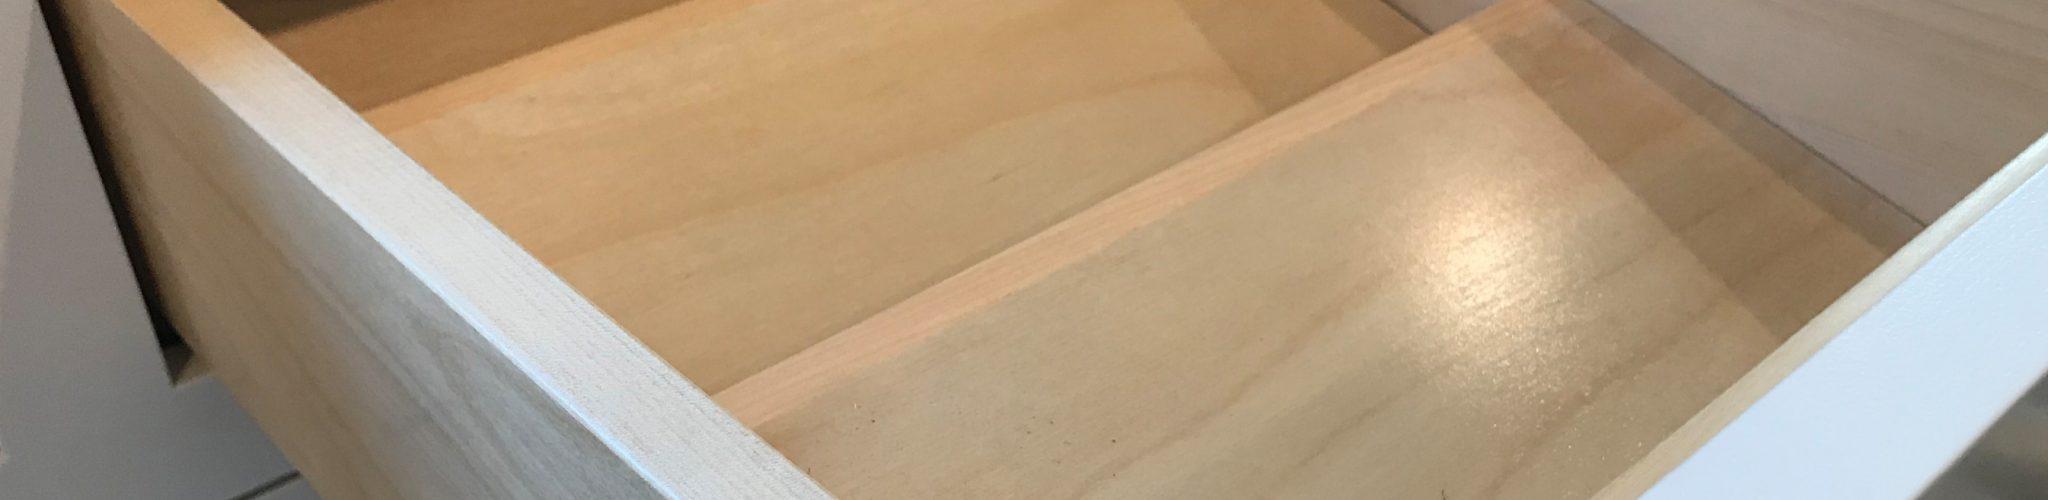 spice_rack_drawer_1